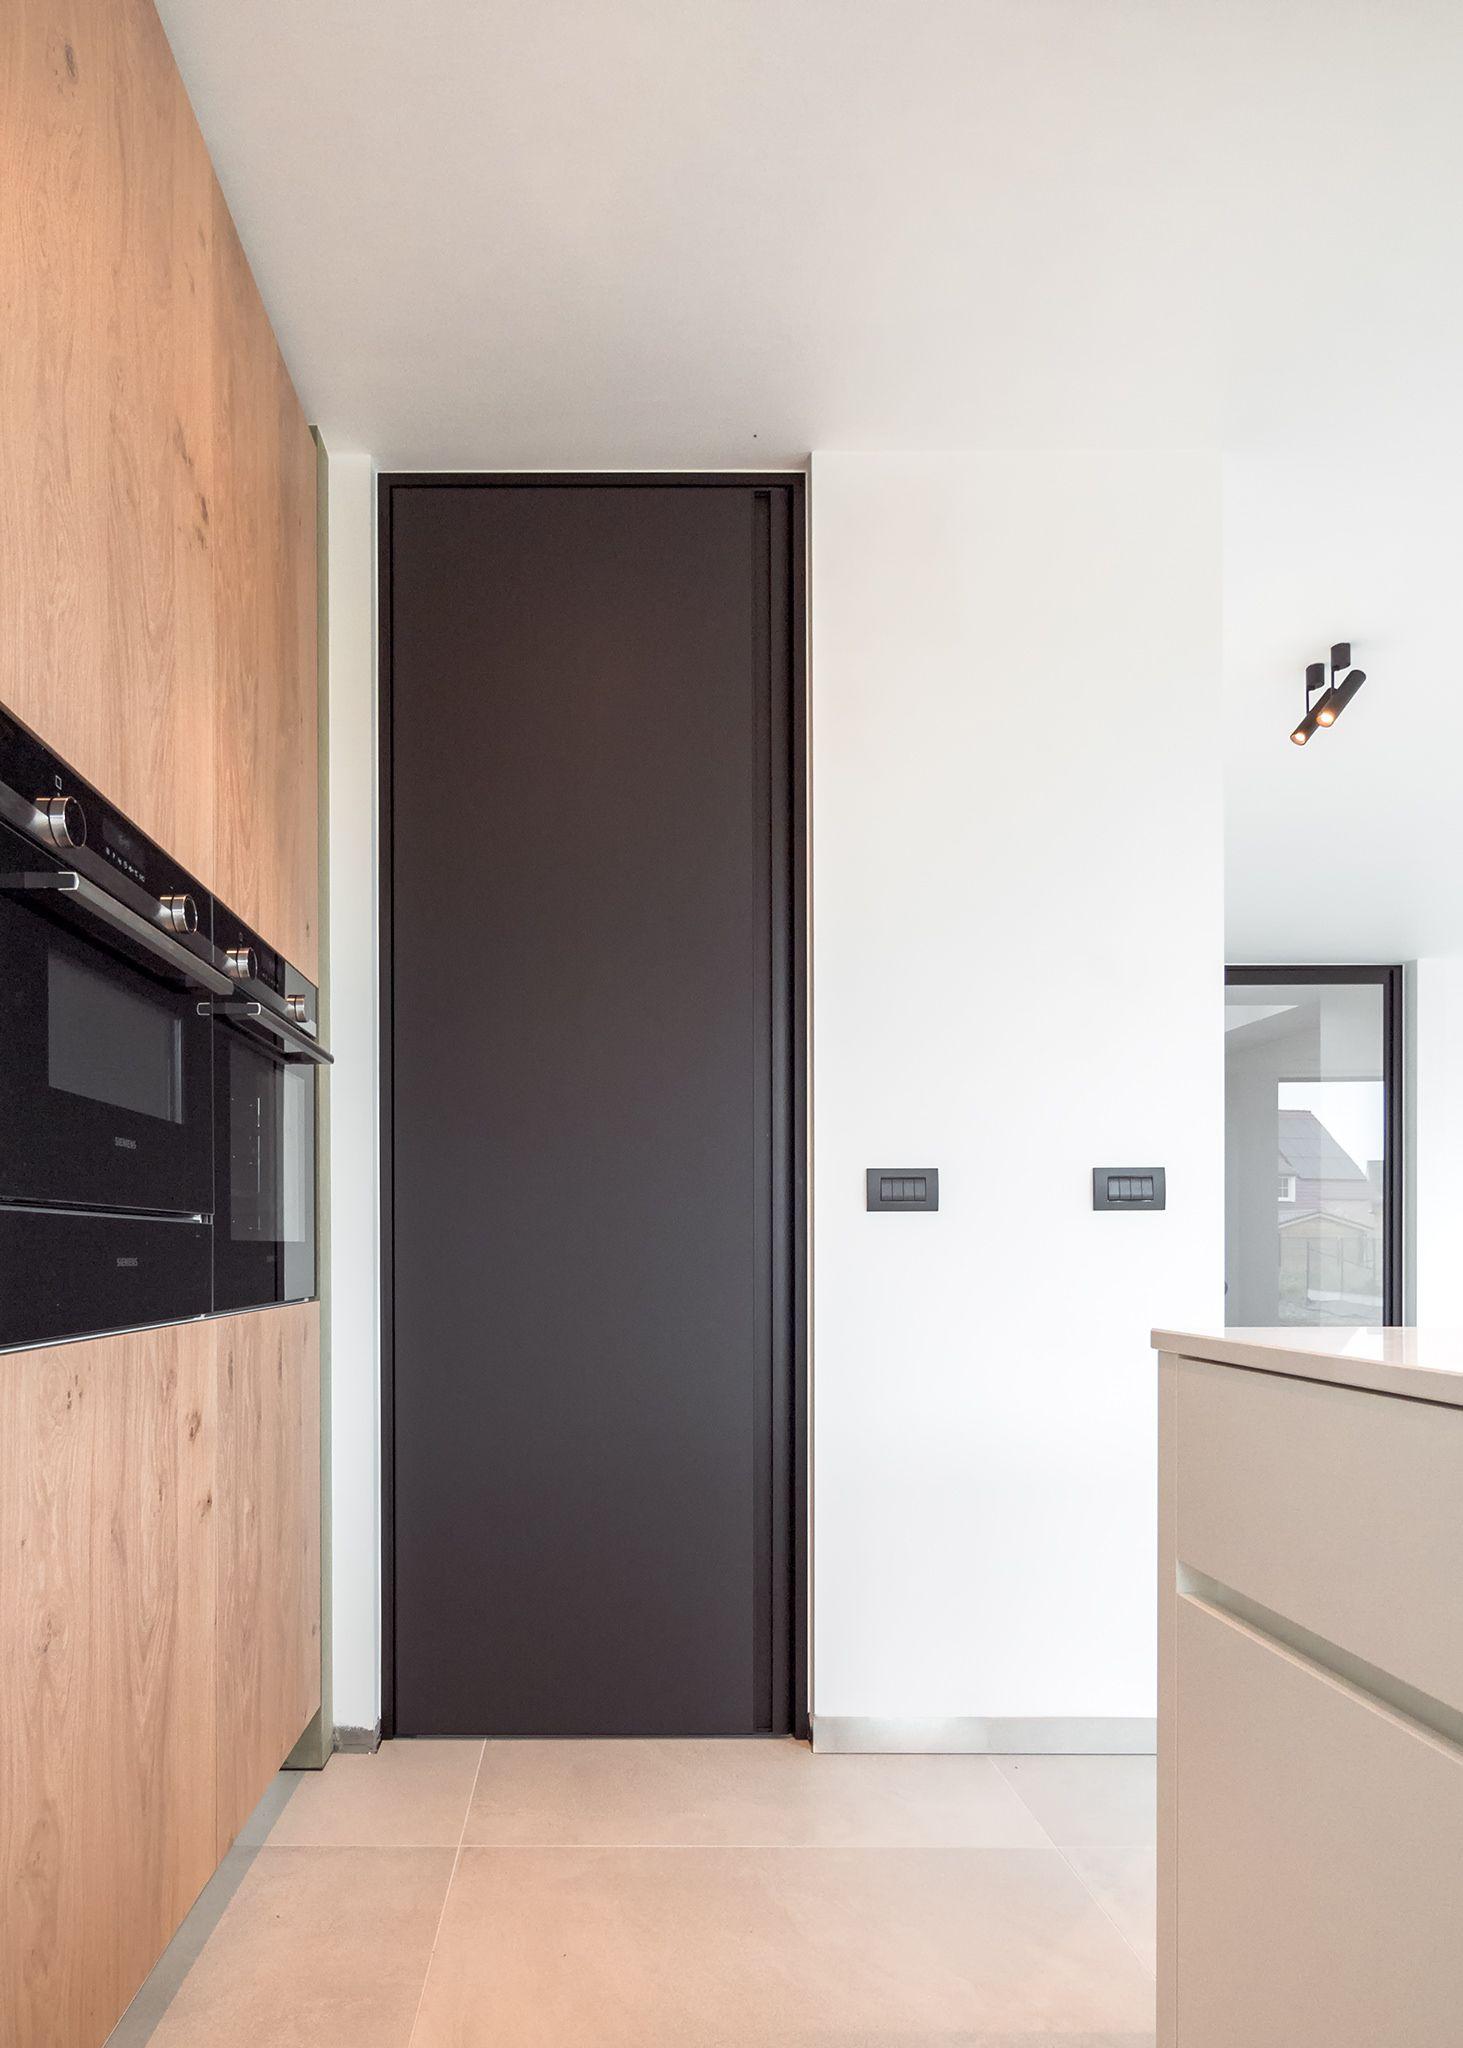 Deuren Op Maat.Moderne Zwarte Binnendeur Op Maat Van Vloer Tot Plafond